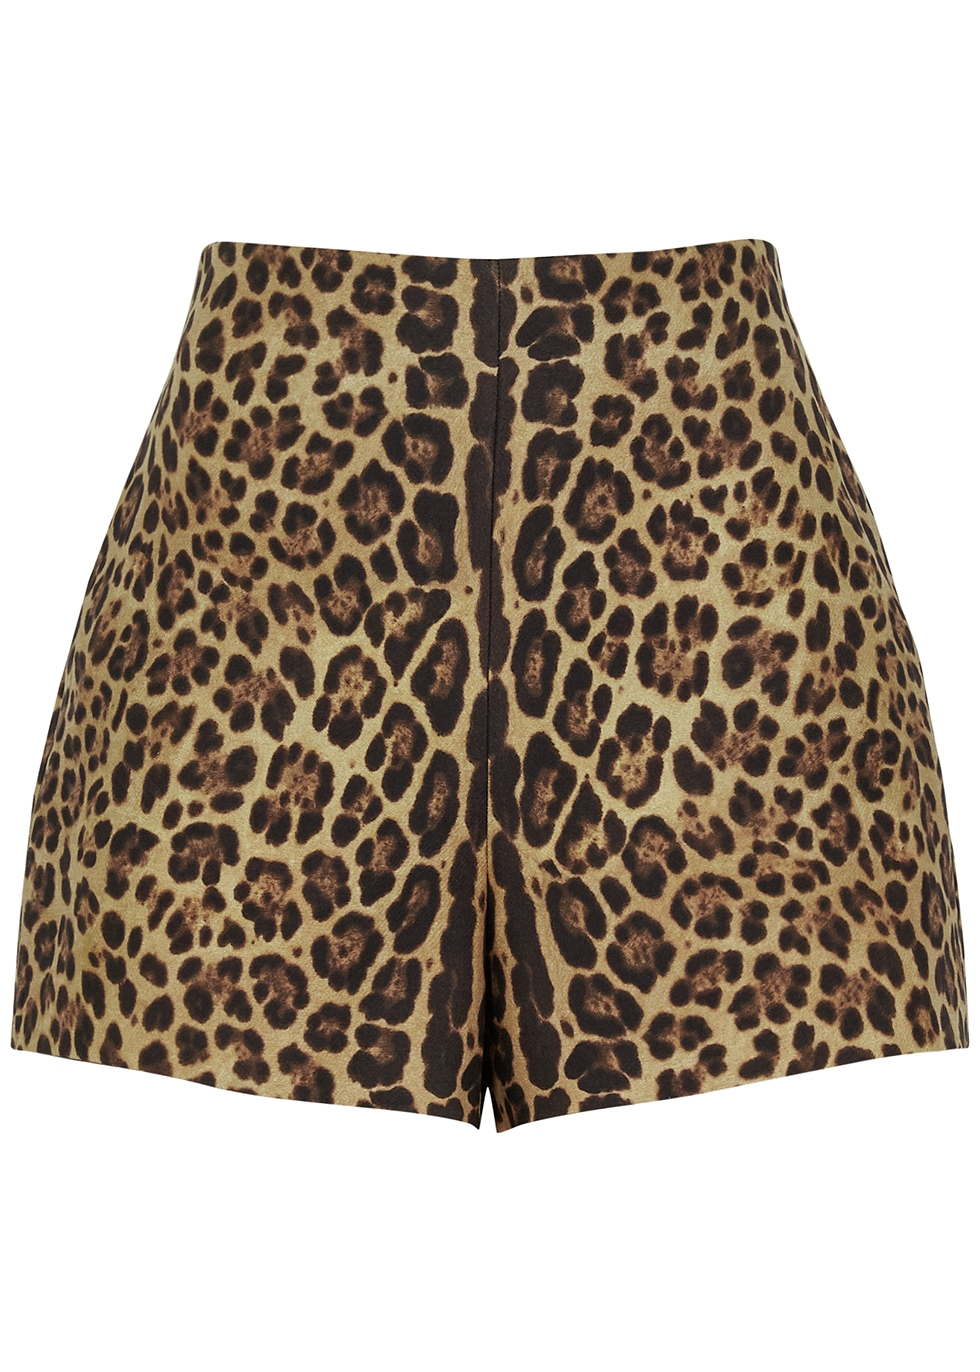 Leopard-print wool-blend shorts